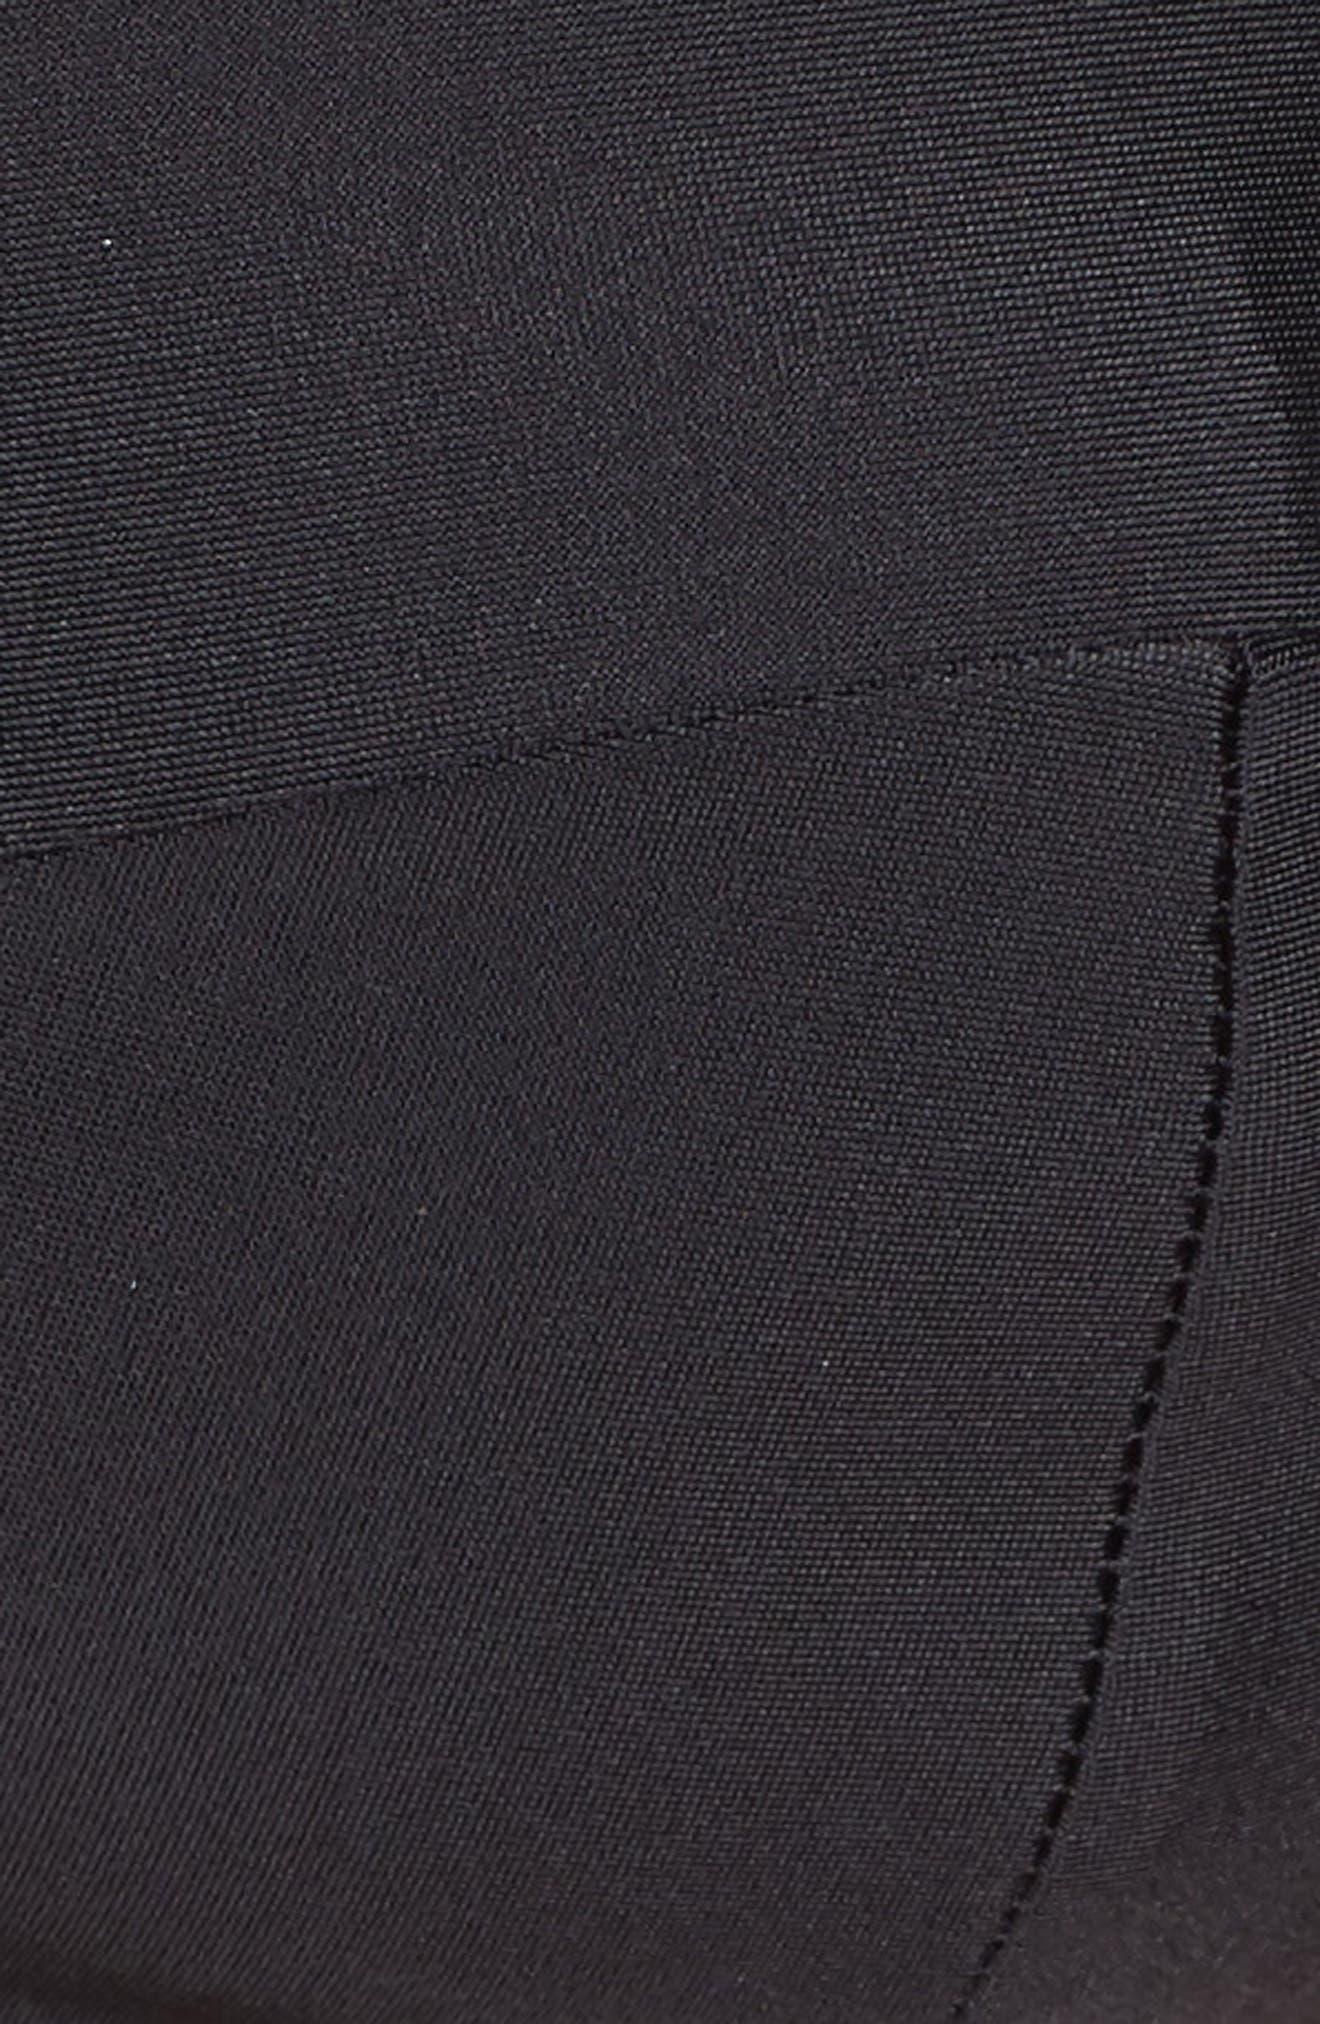 Bouloux II Underwire Bikini Top,                             Alternate thumbnail 6, color,                             001